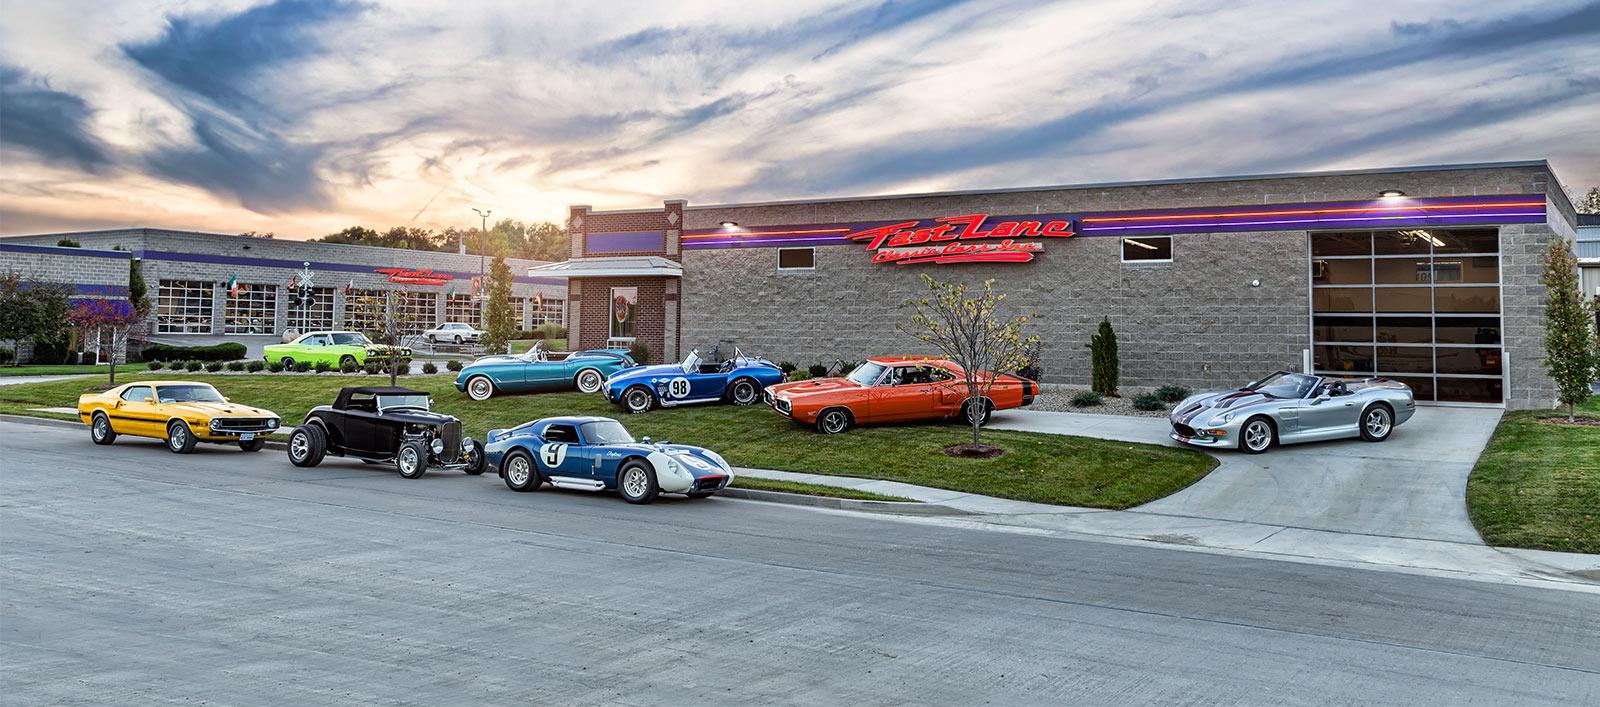 old car lot | Carsjp.com